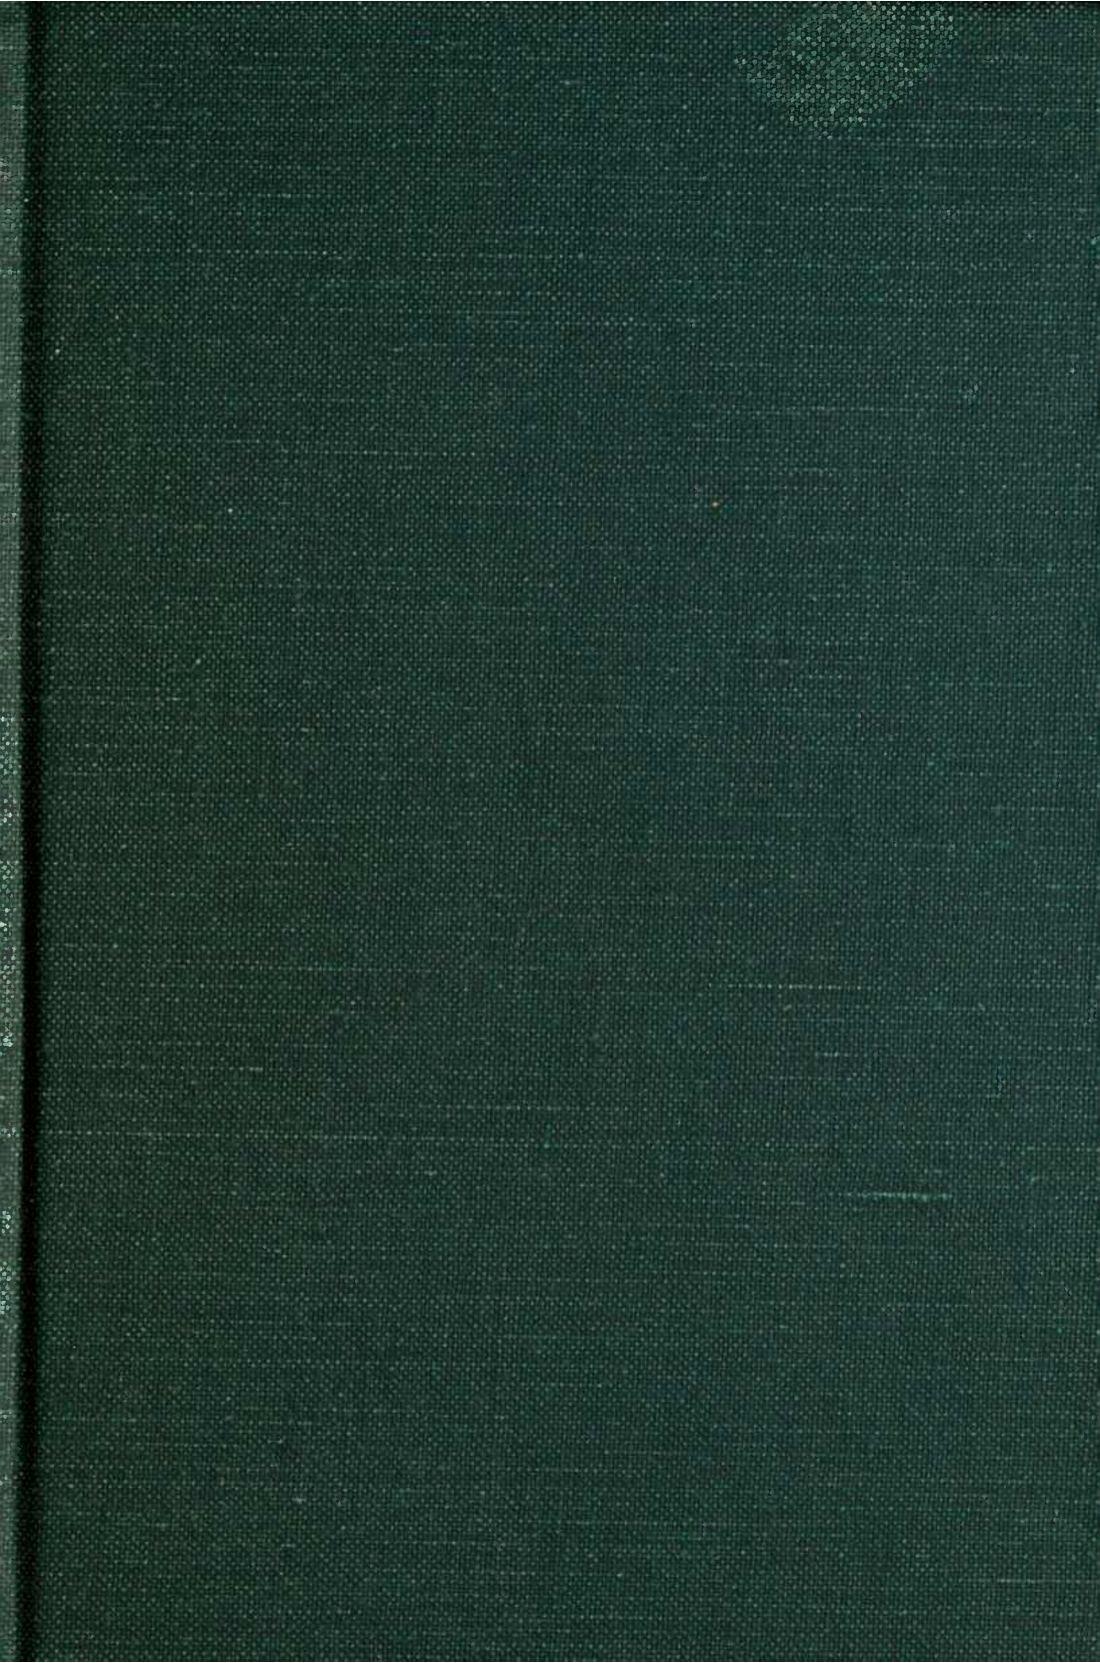 Calaméo - The Humbugs of the World, An Account of Humbugs